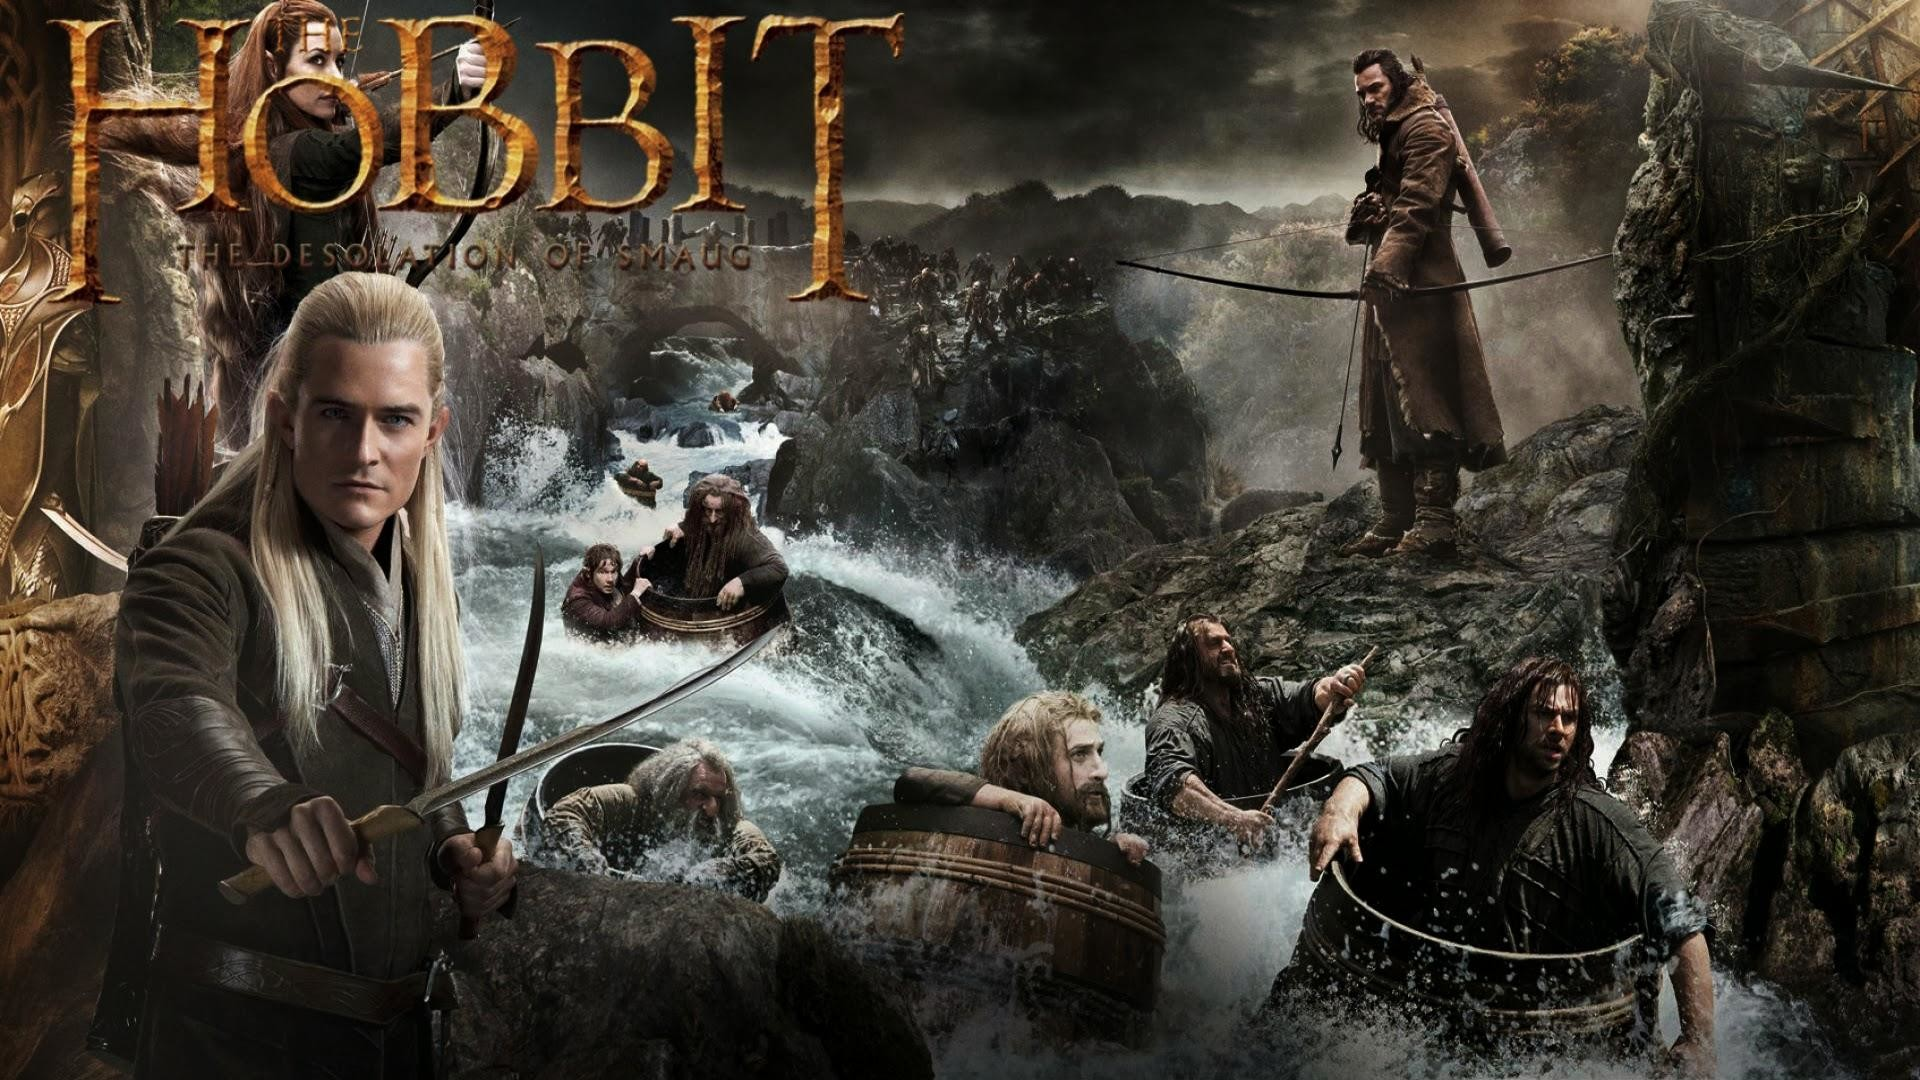 Beautiful-The-Hobbit-Wallpaper-11